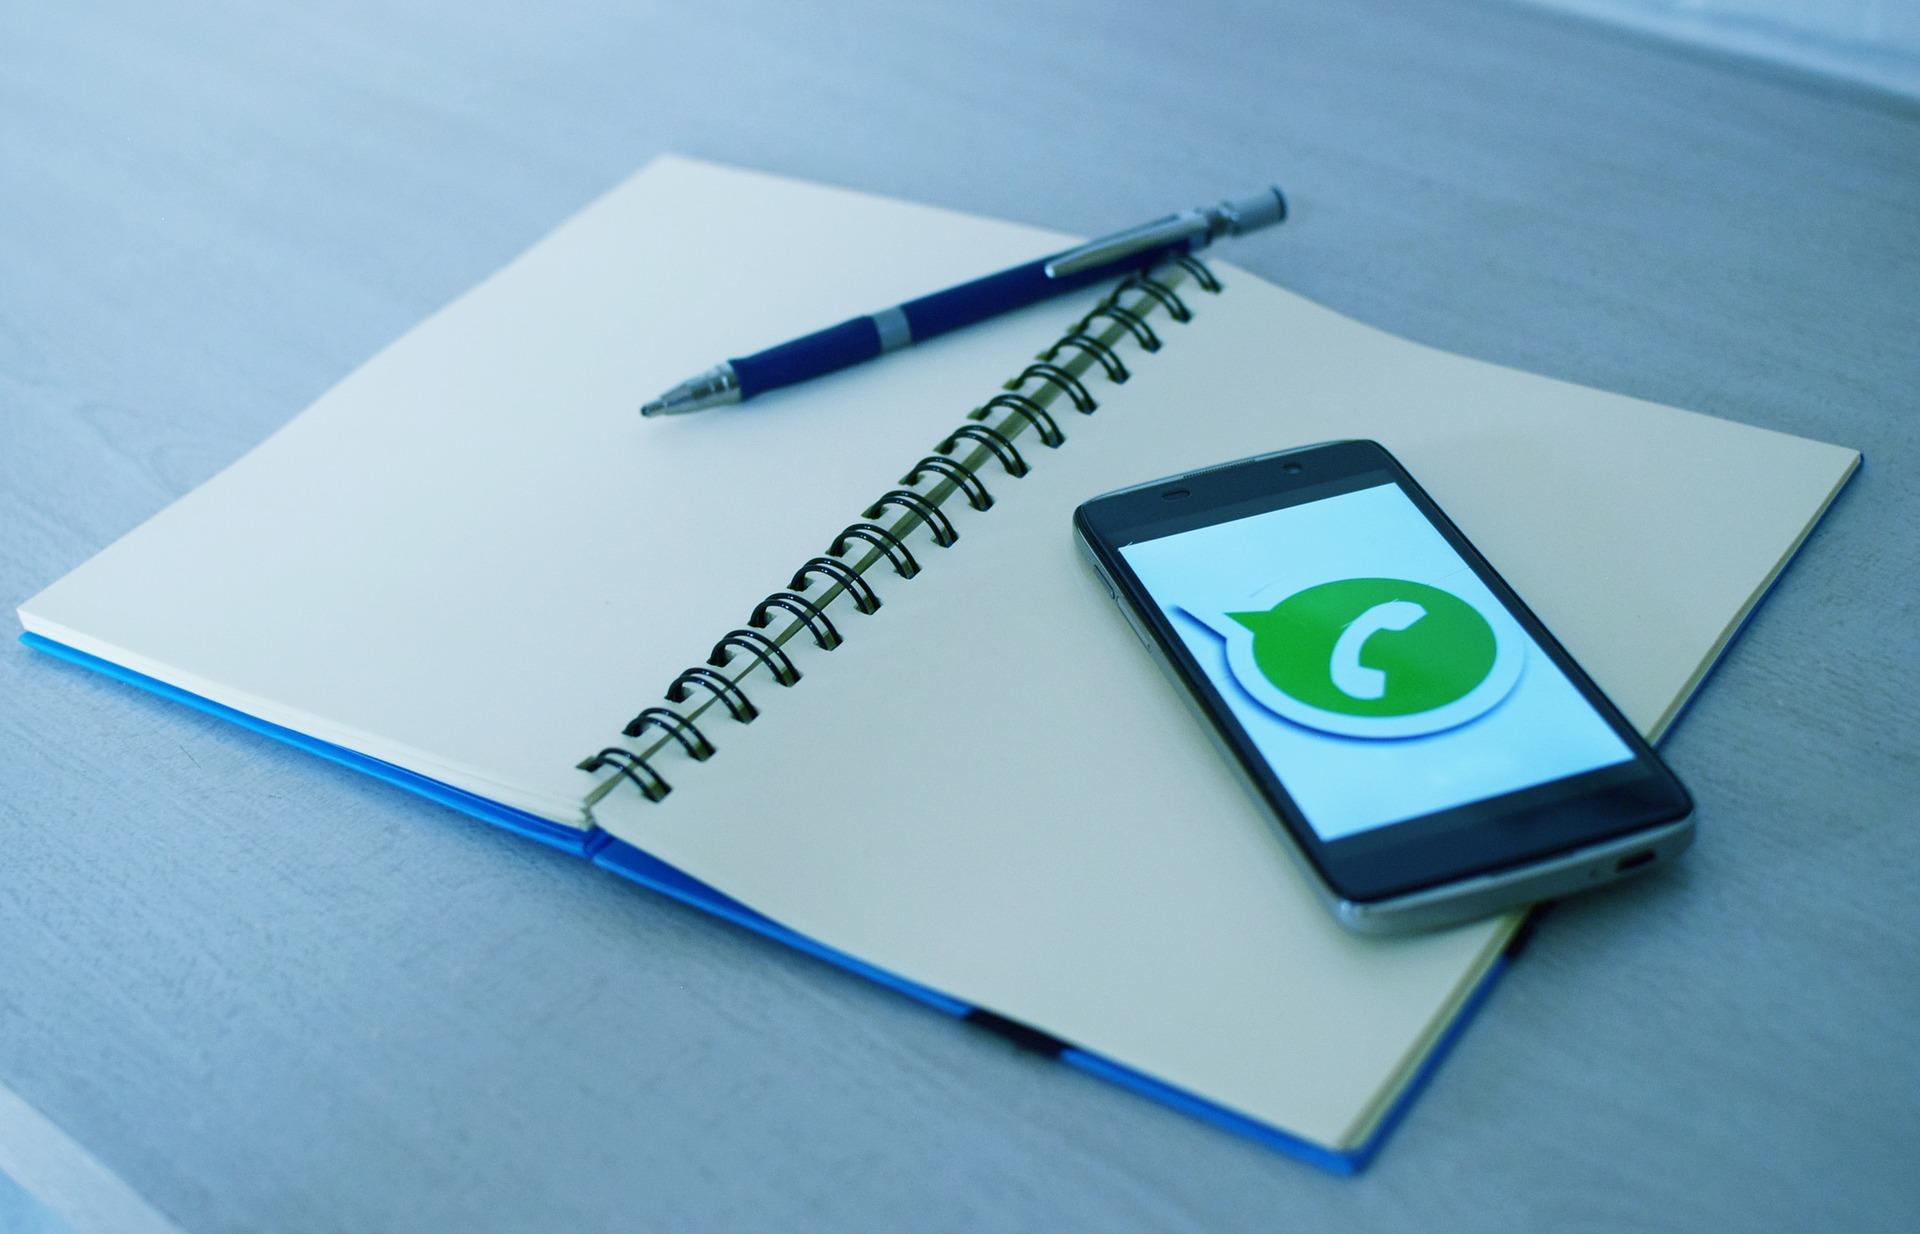 Whatsapp Is Now Home 2 Billion Users